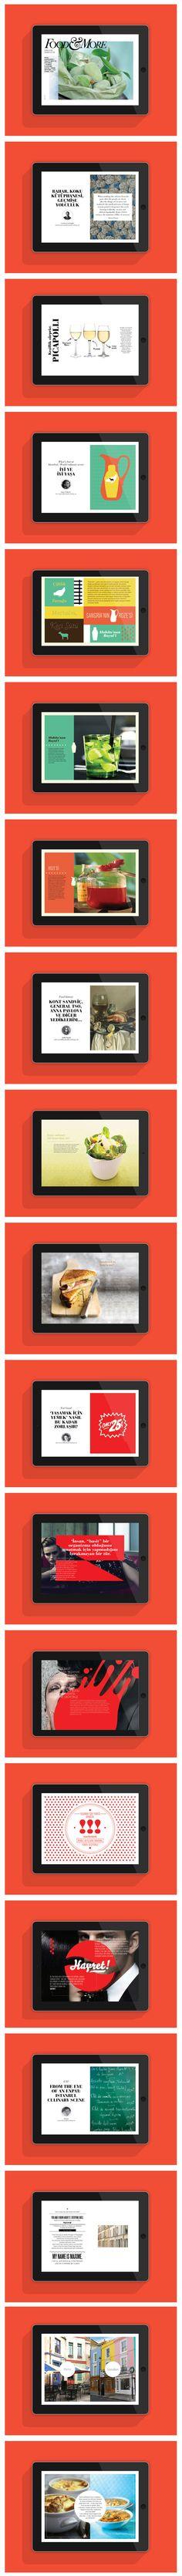 Food & More iPad magazine